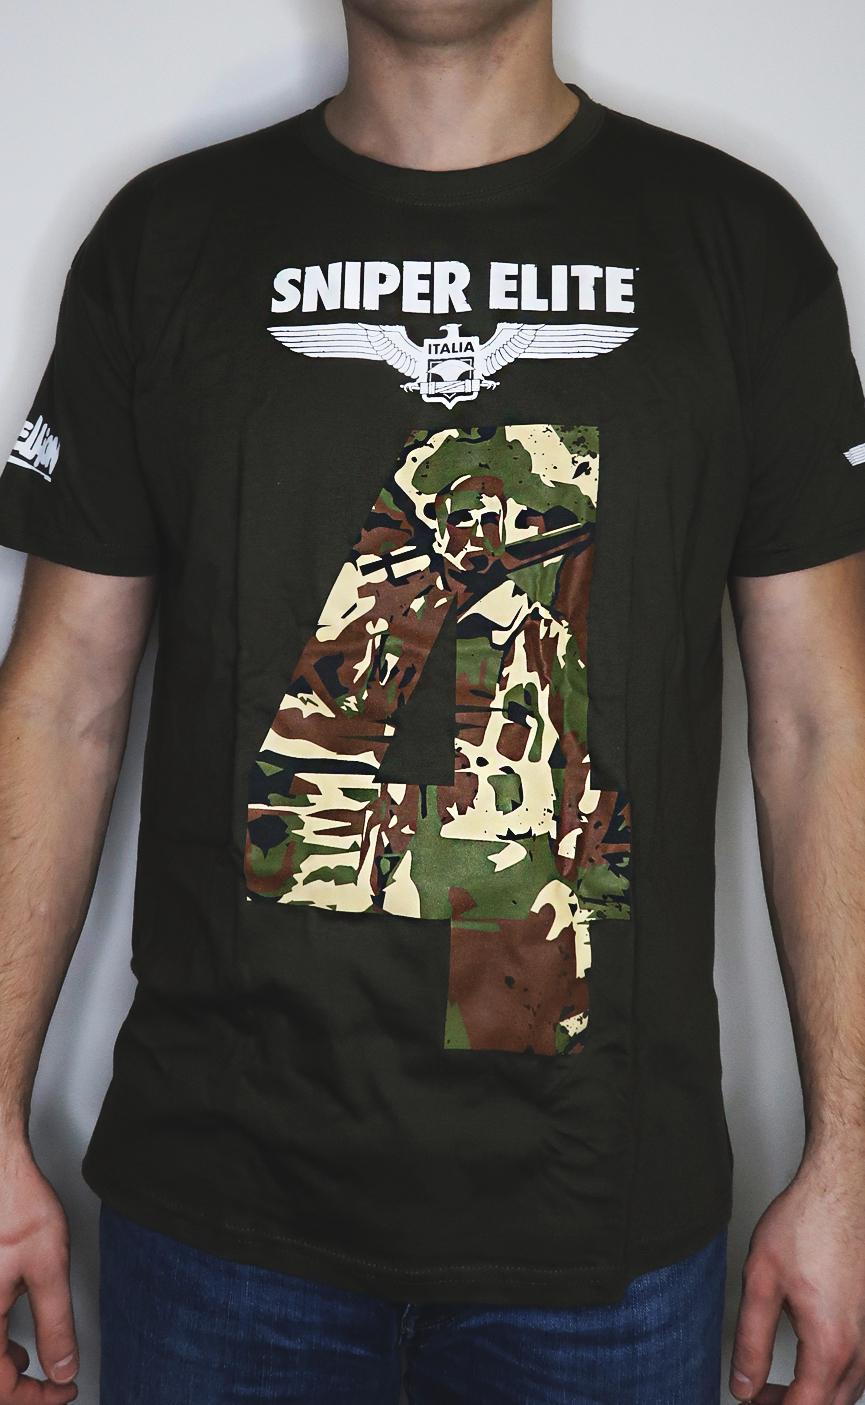 Koszulka z gry Sniper Elite 4 rozmiar L